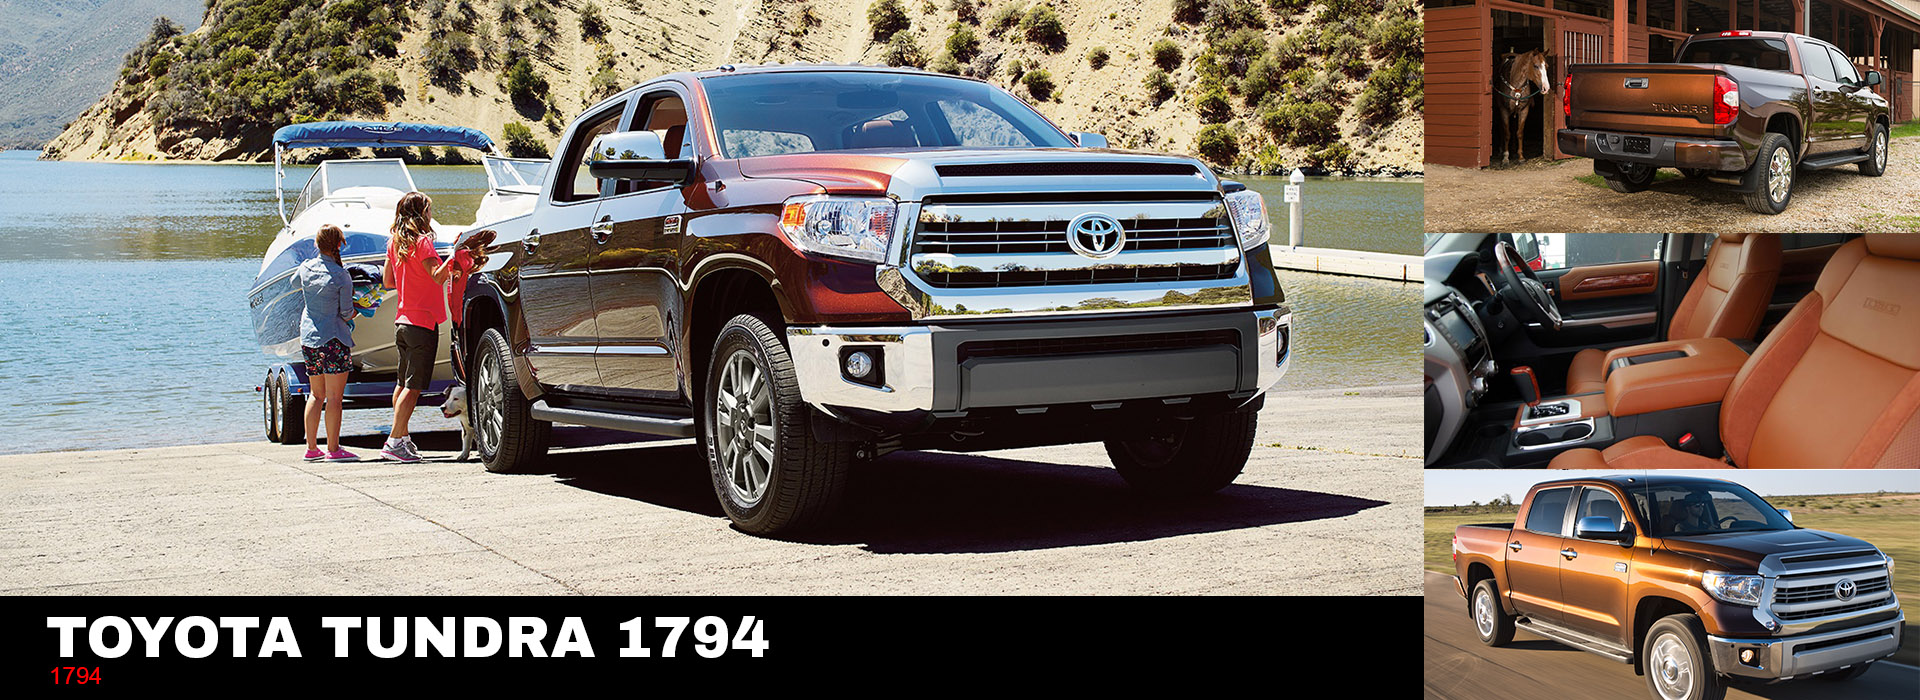 Toyota Tundra Trucks for sale